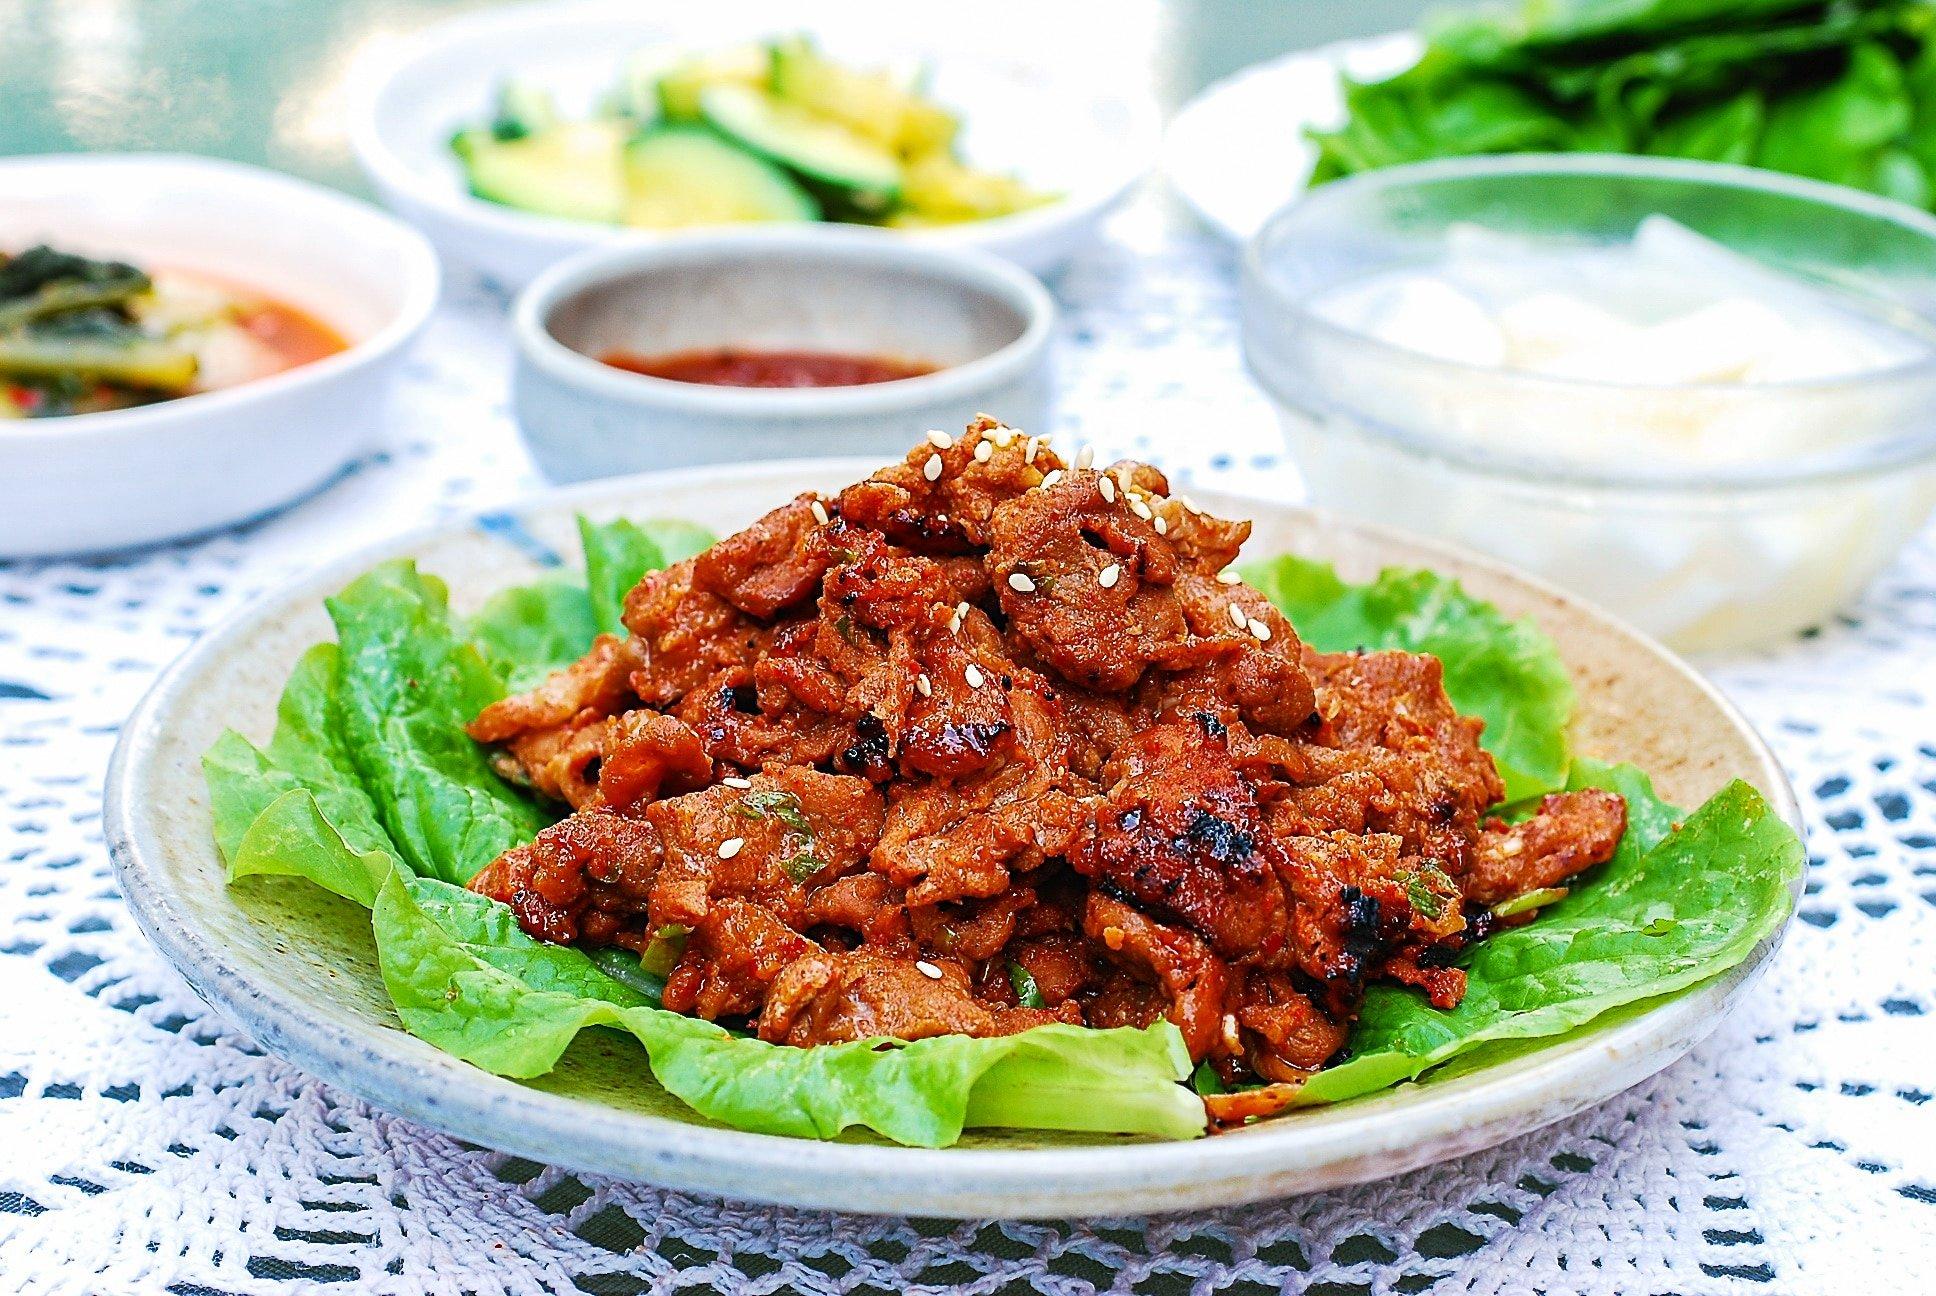 DSC 1830 2 1 - Jeyuk Bokkeum (Spicy Pork BBQ)